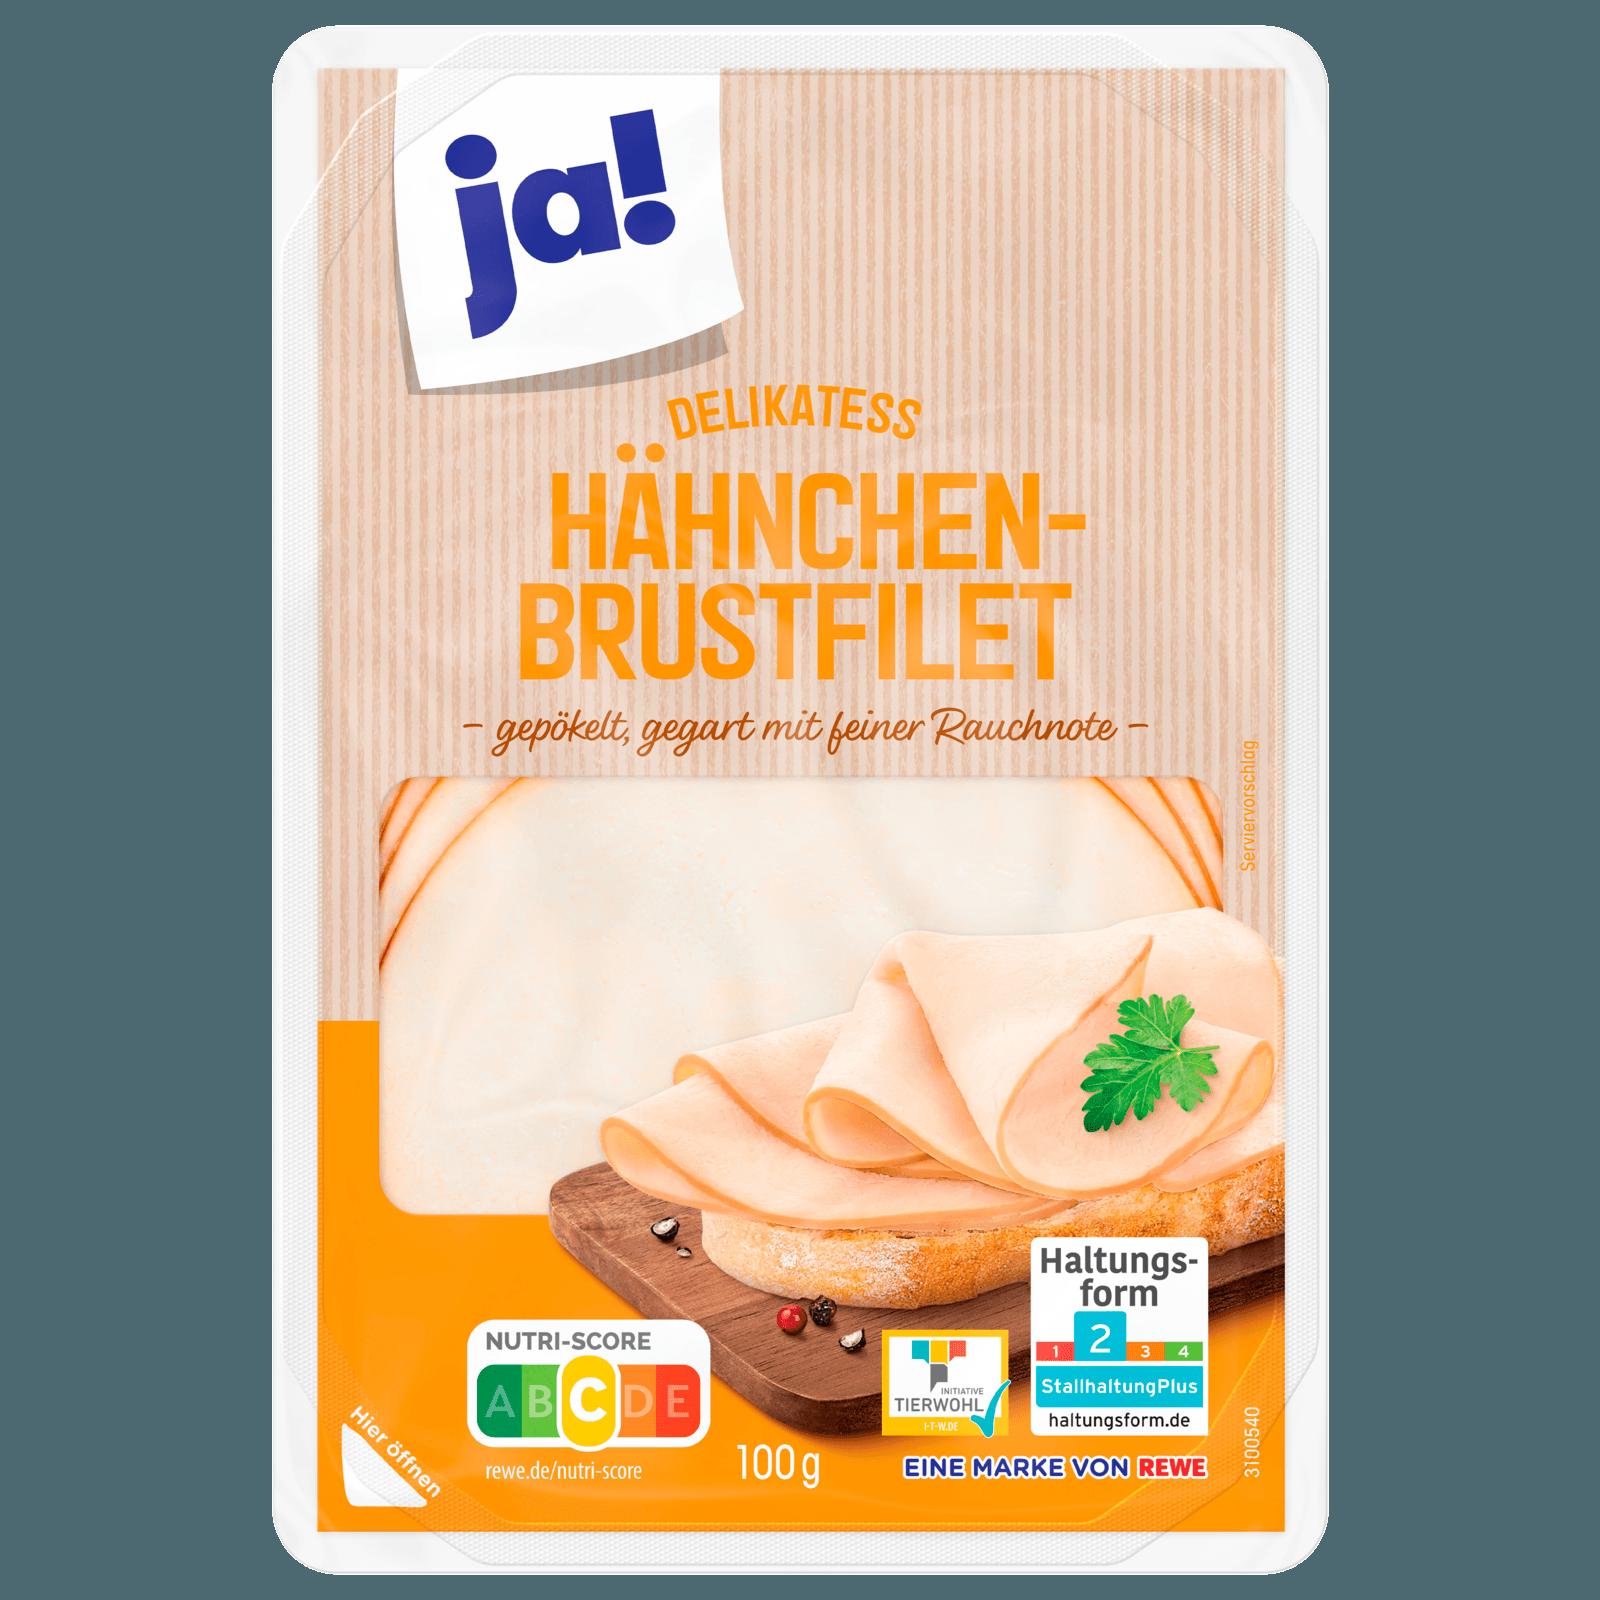 ja! Delikatess-Hähnchenbrustfilet mit feiner Rauchnote 100g